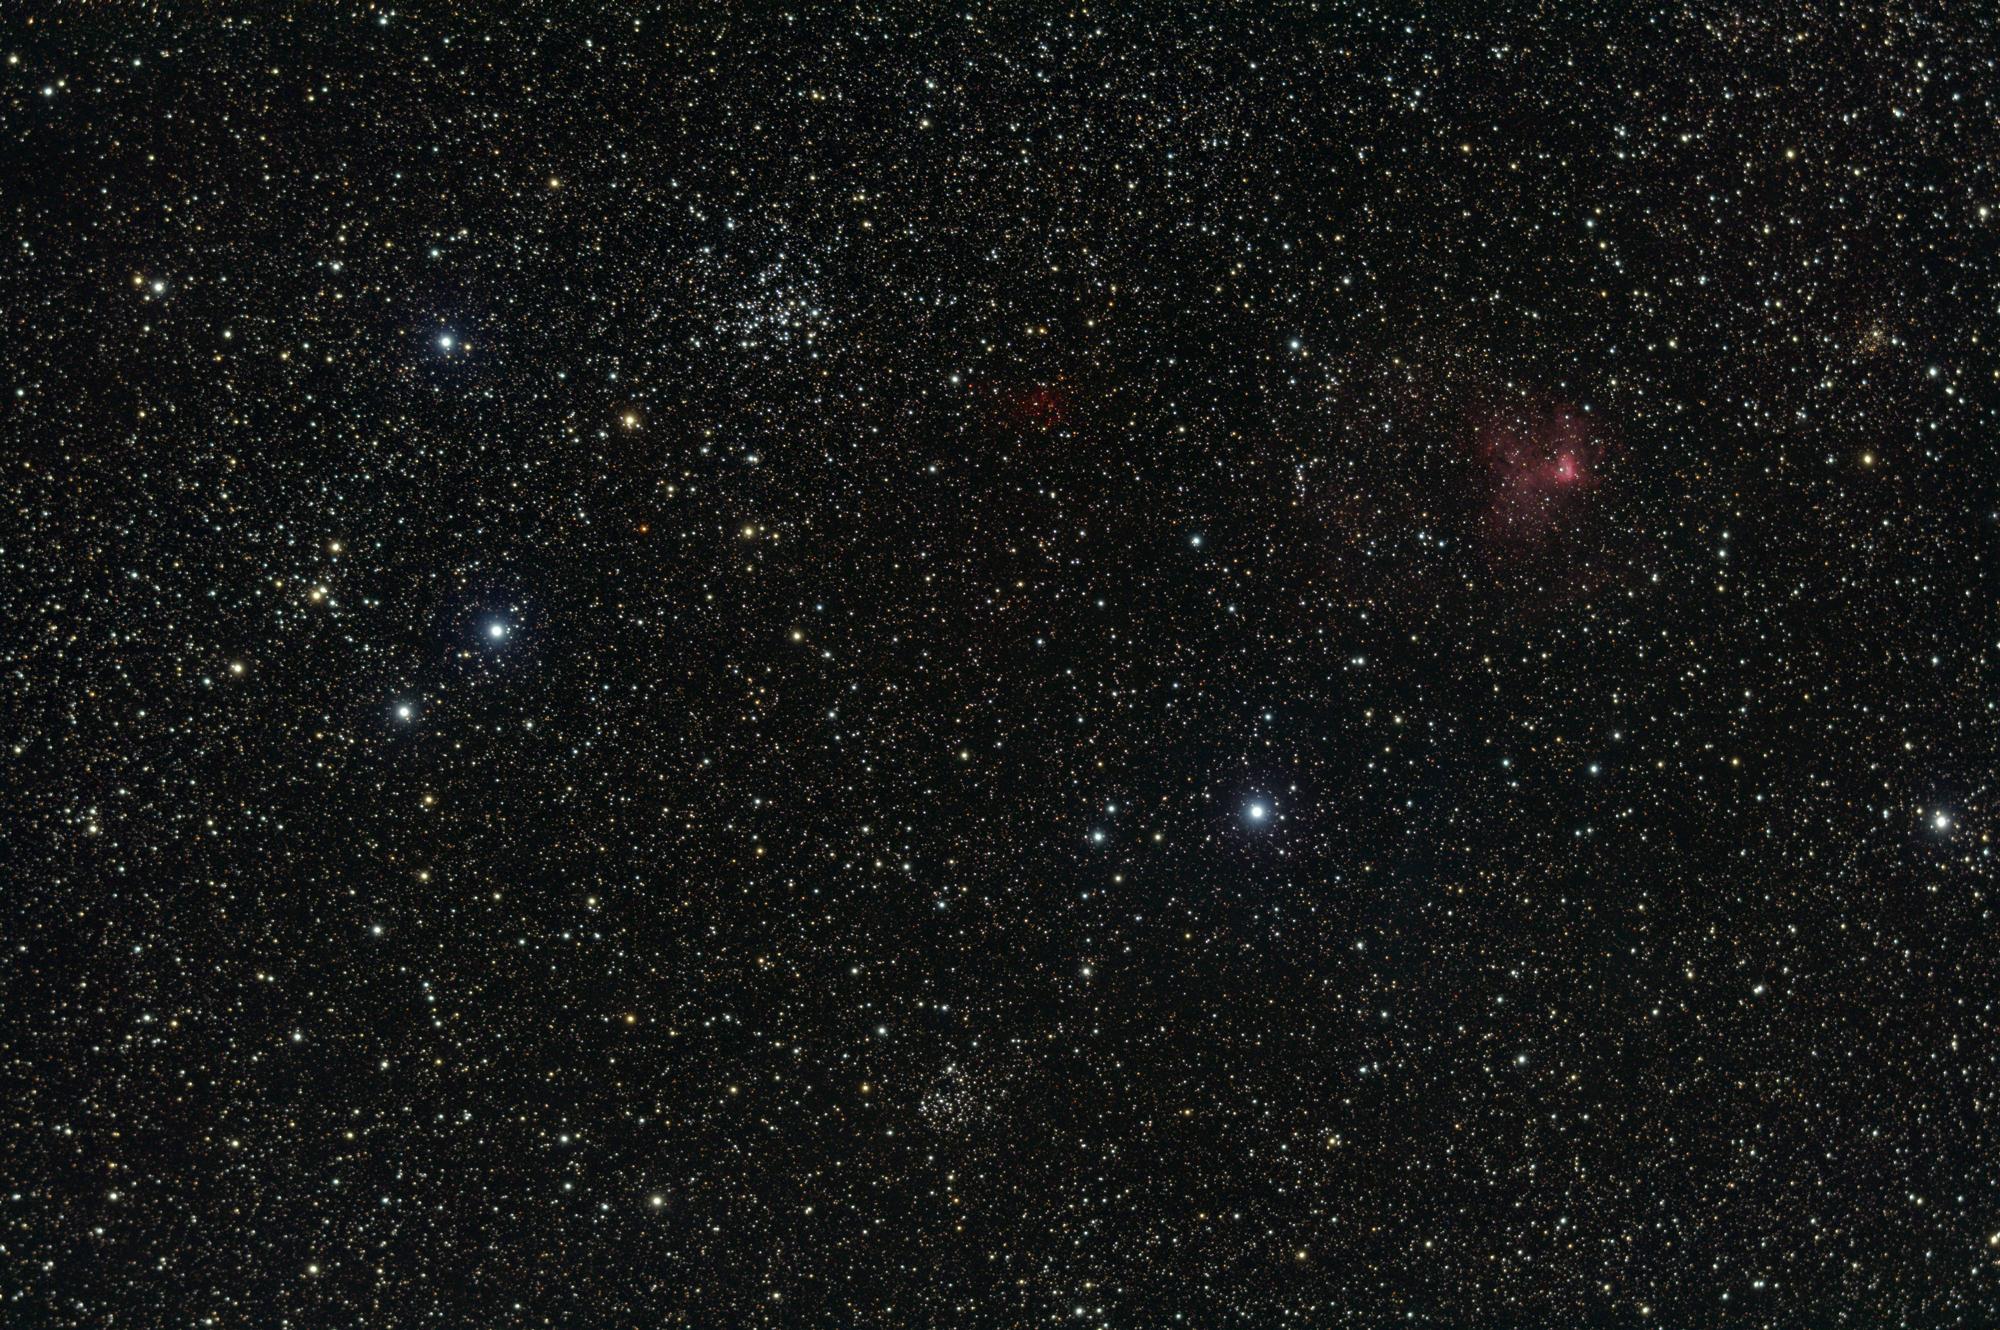 NGC-1528-1545-1513-Sh209-206 jpg